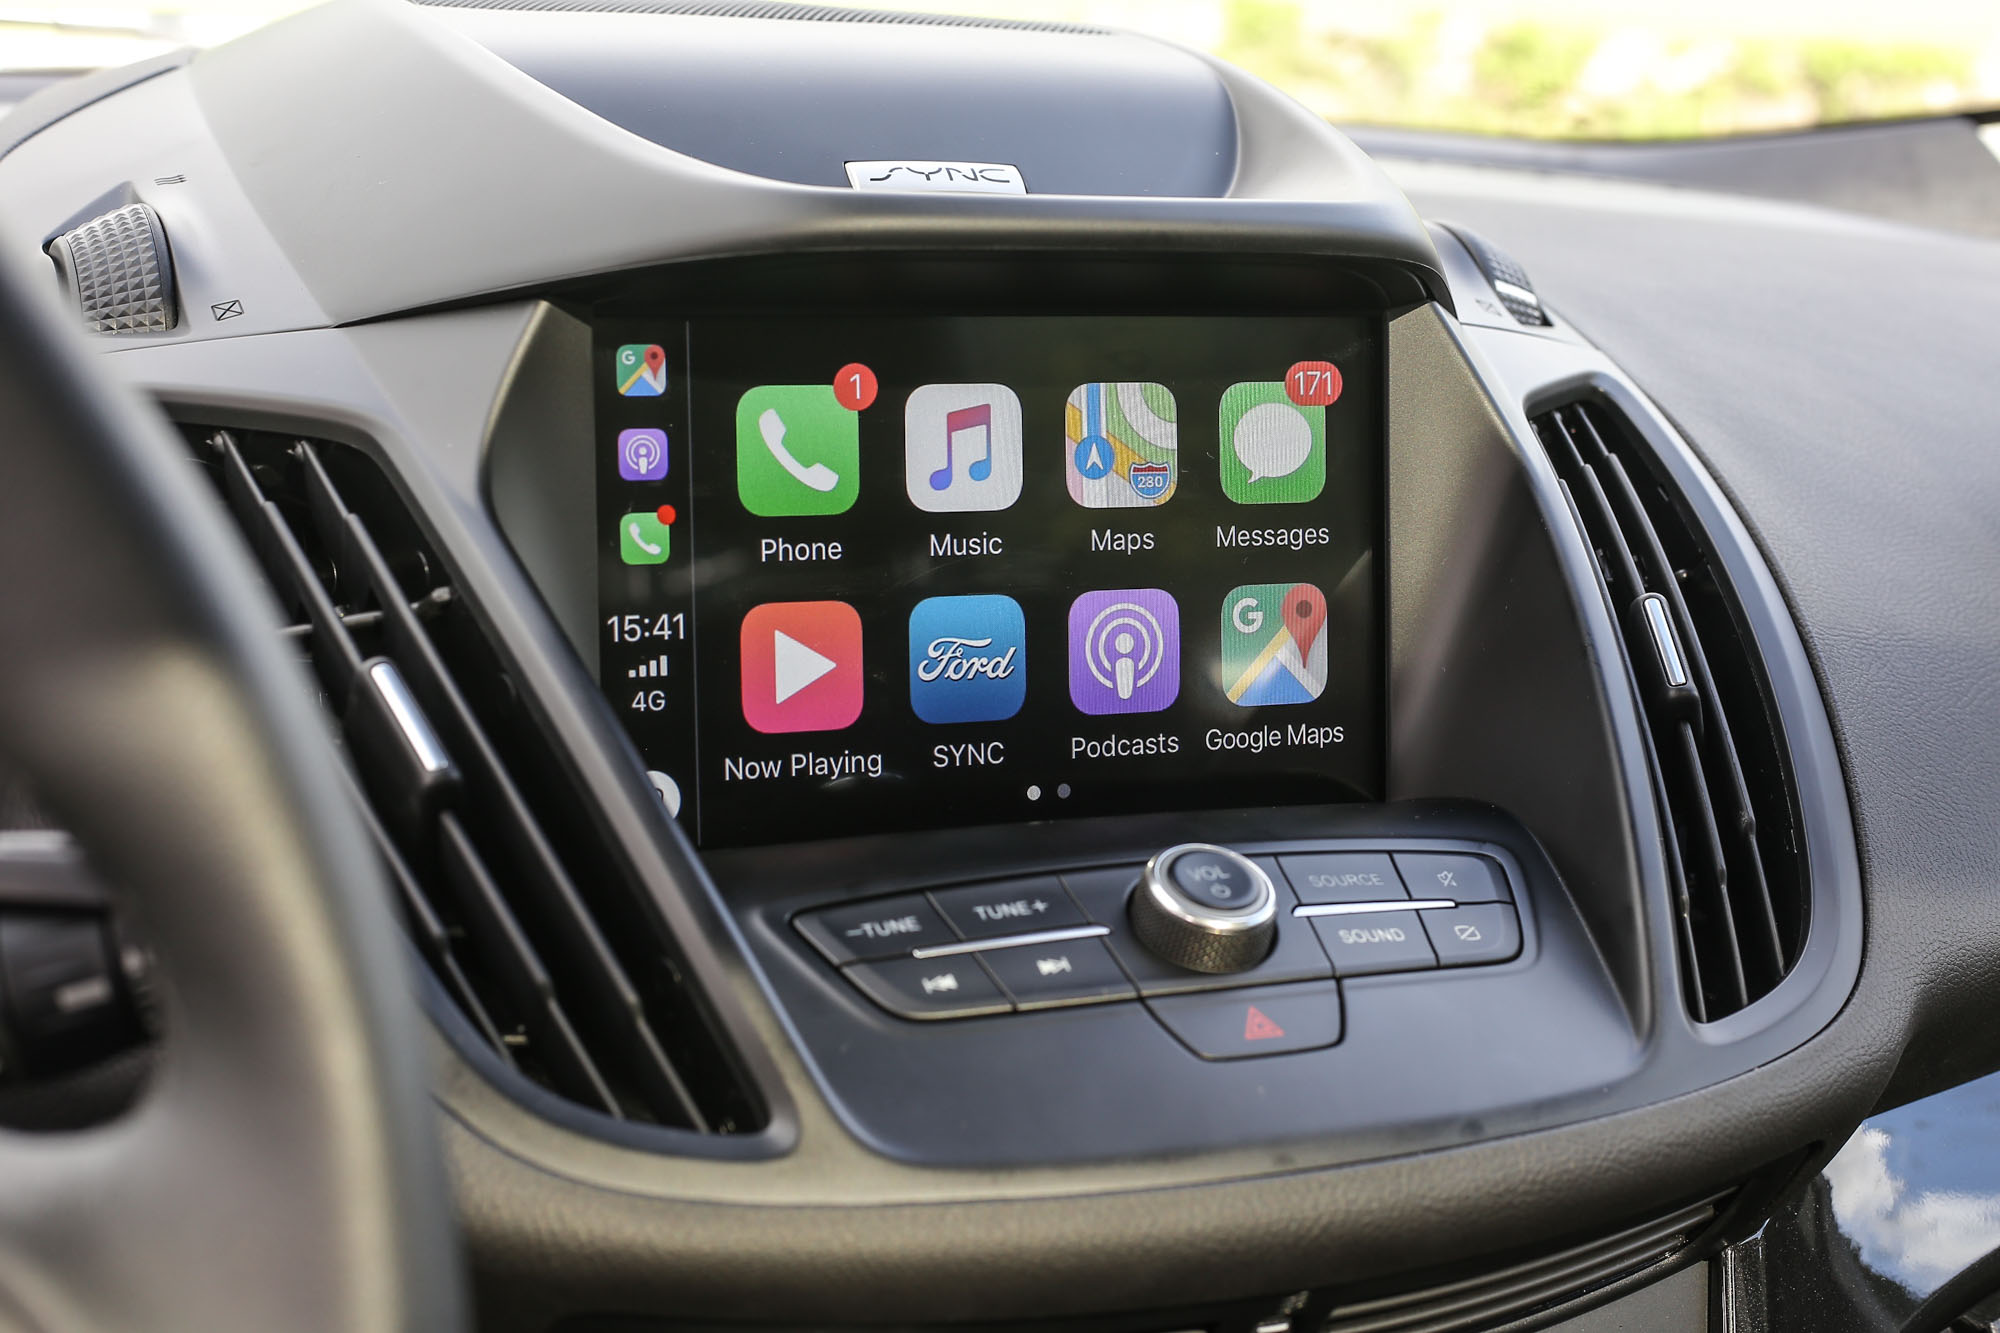 Kuga EcoBoost182 CP360 以上車型配備 SYNC 3 娛樂通訊整合系統,在 8 吋螢幕內具備有如 Apple CarPlay 手機整合裝置。